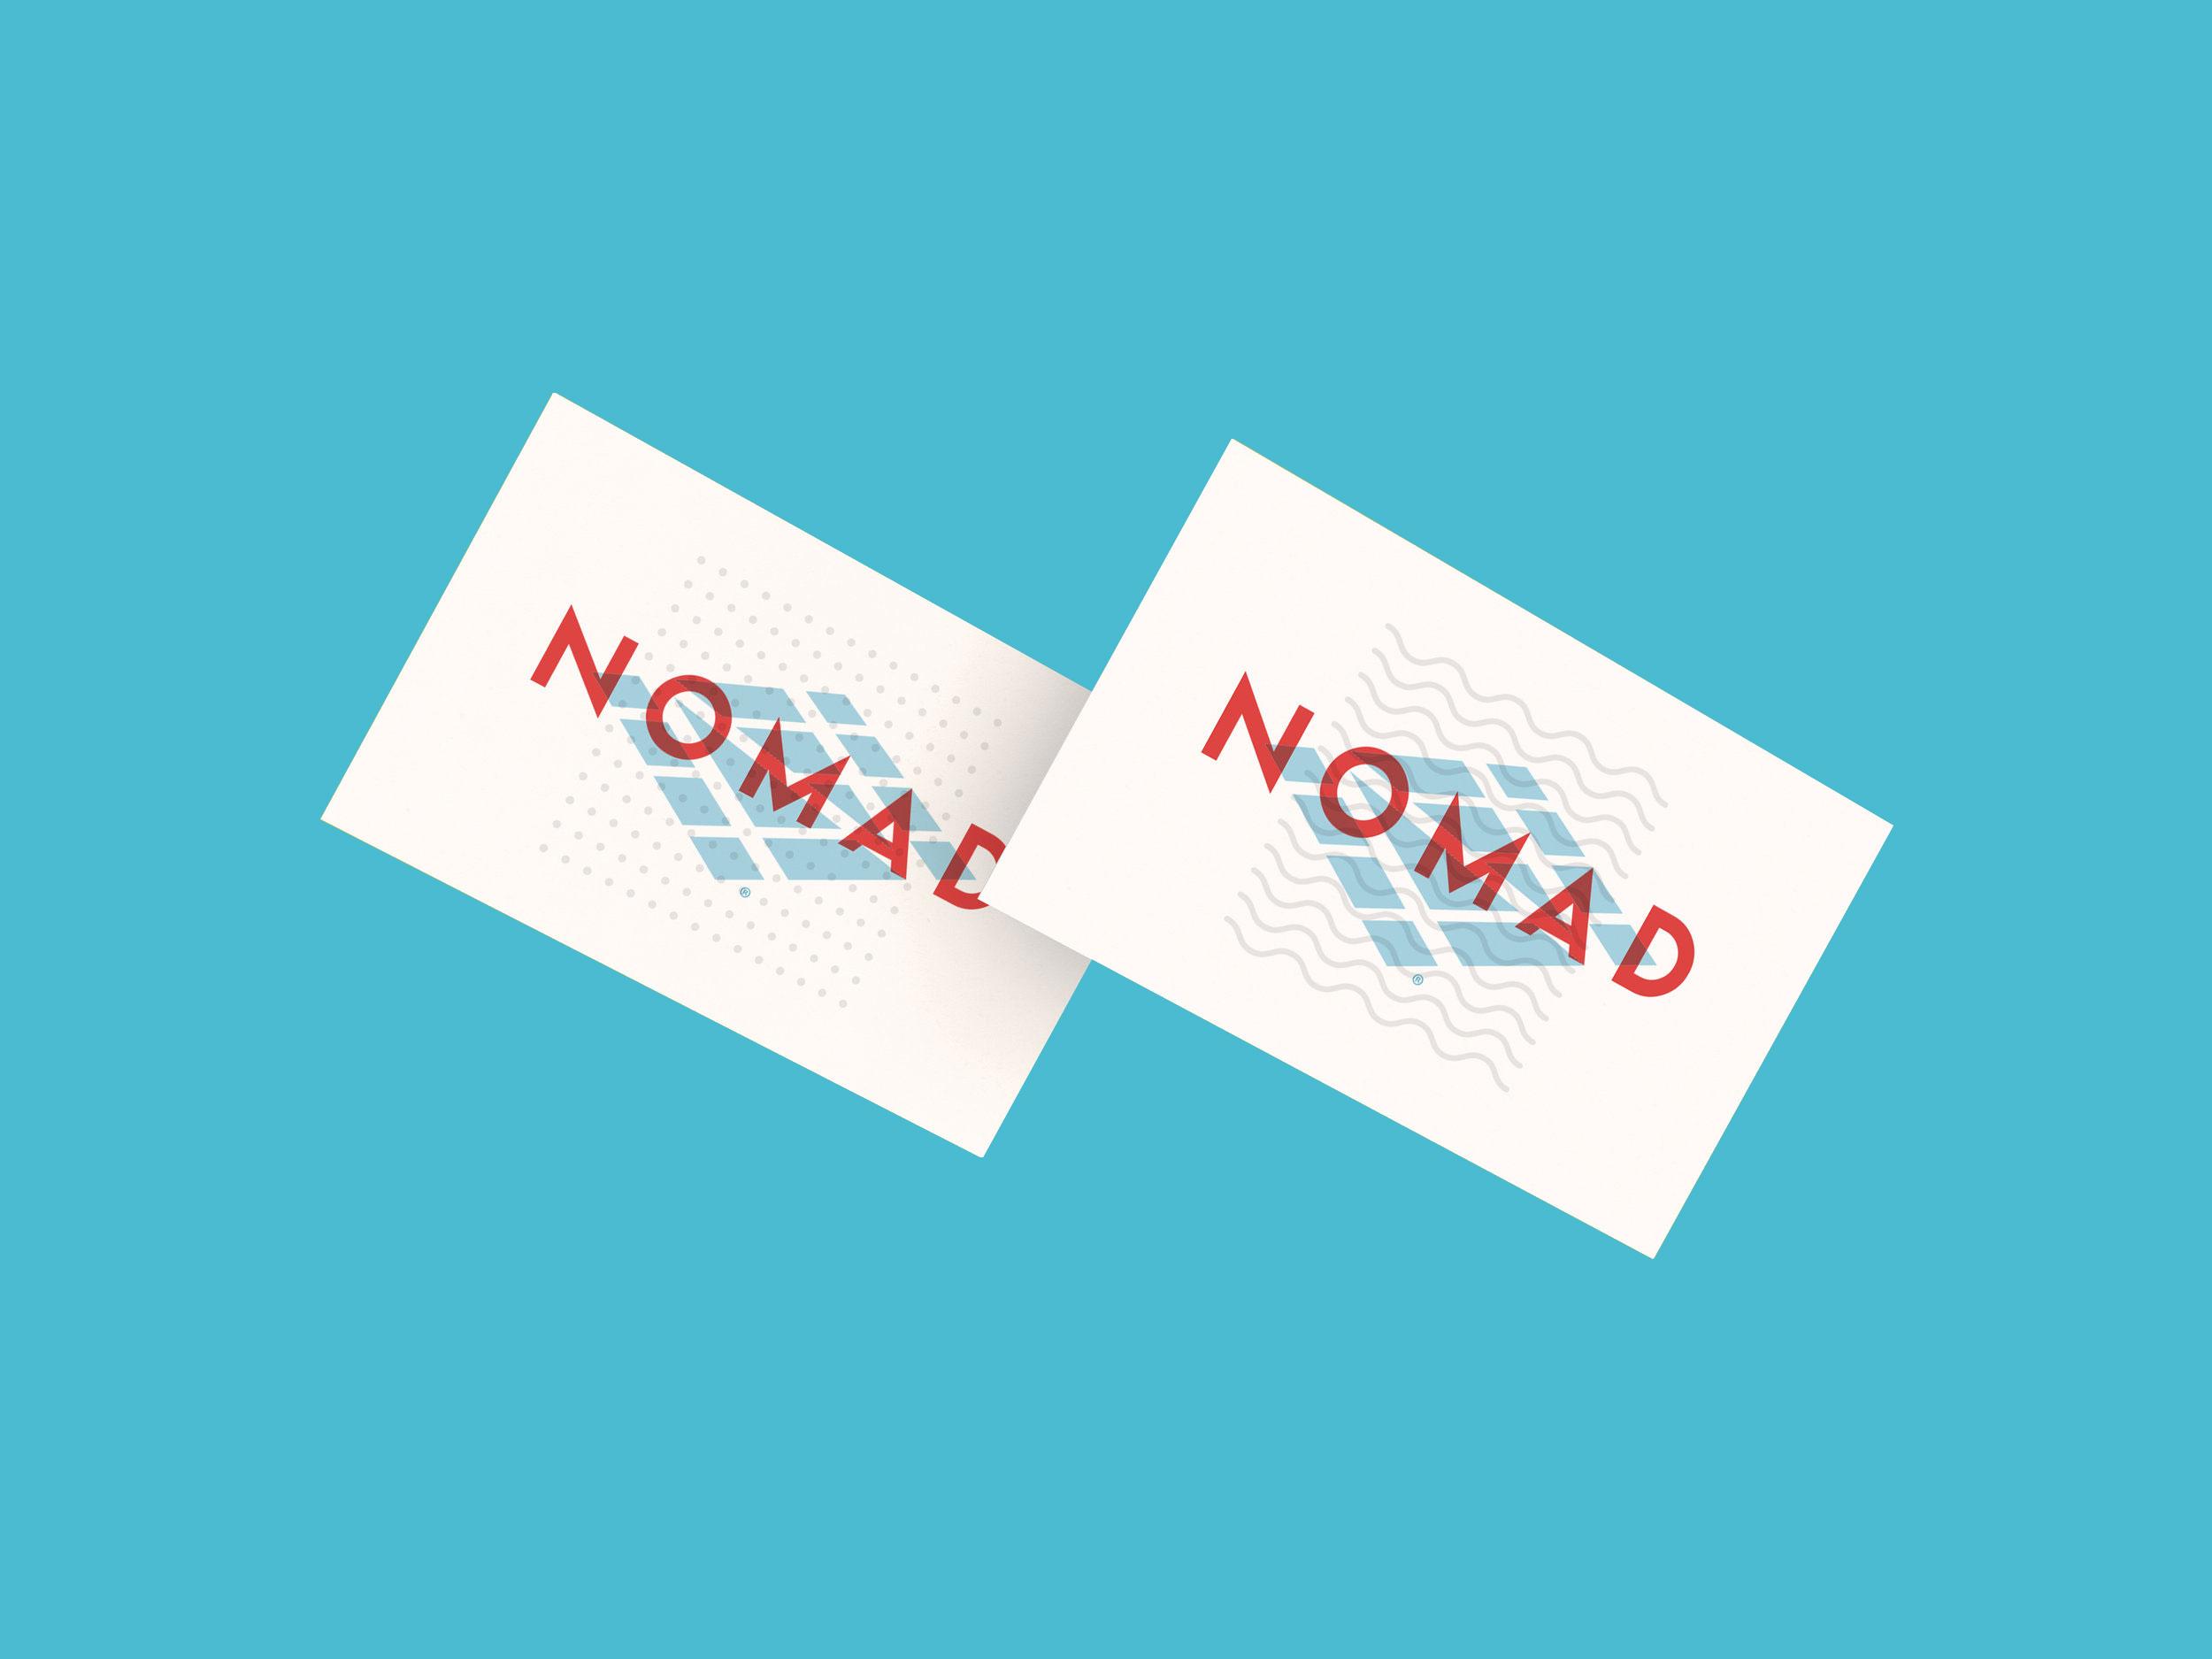 Studio_Bloq-Experience_NoMad_NYC-15.jpg